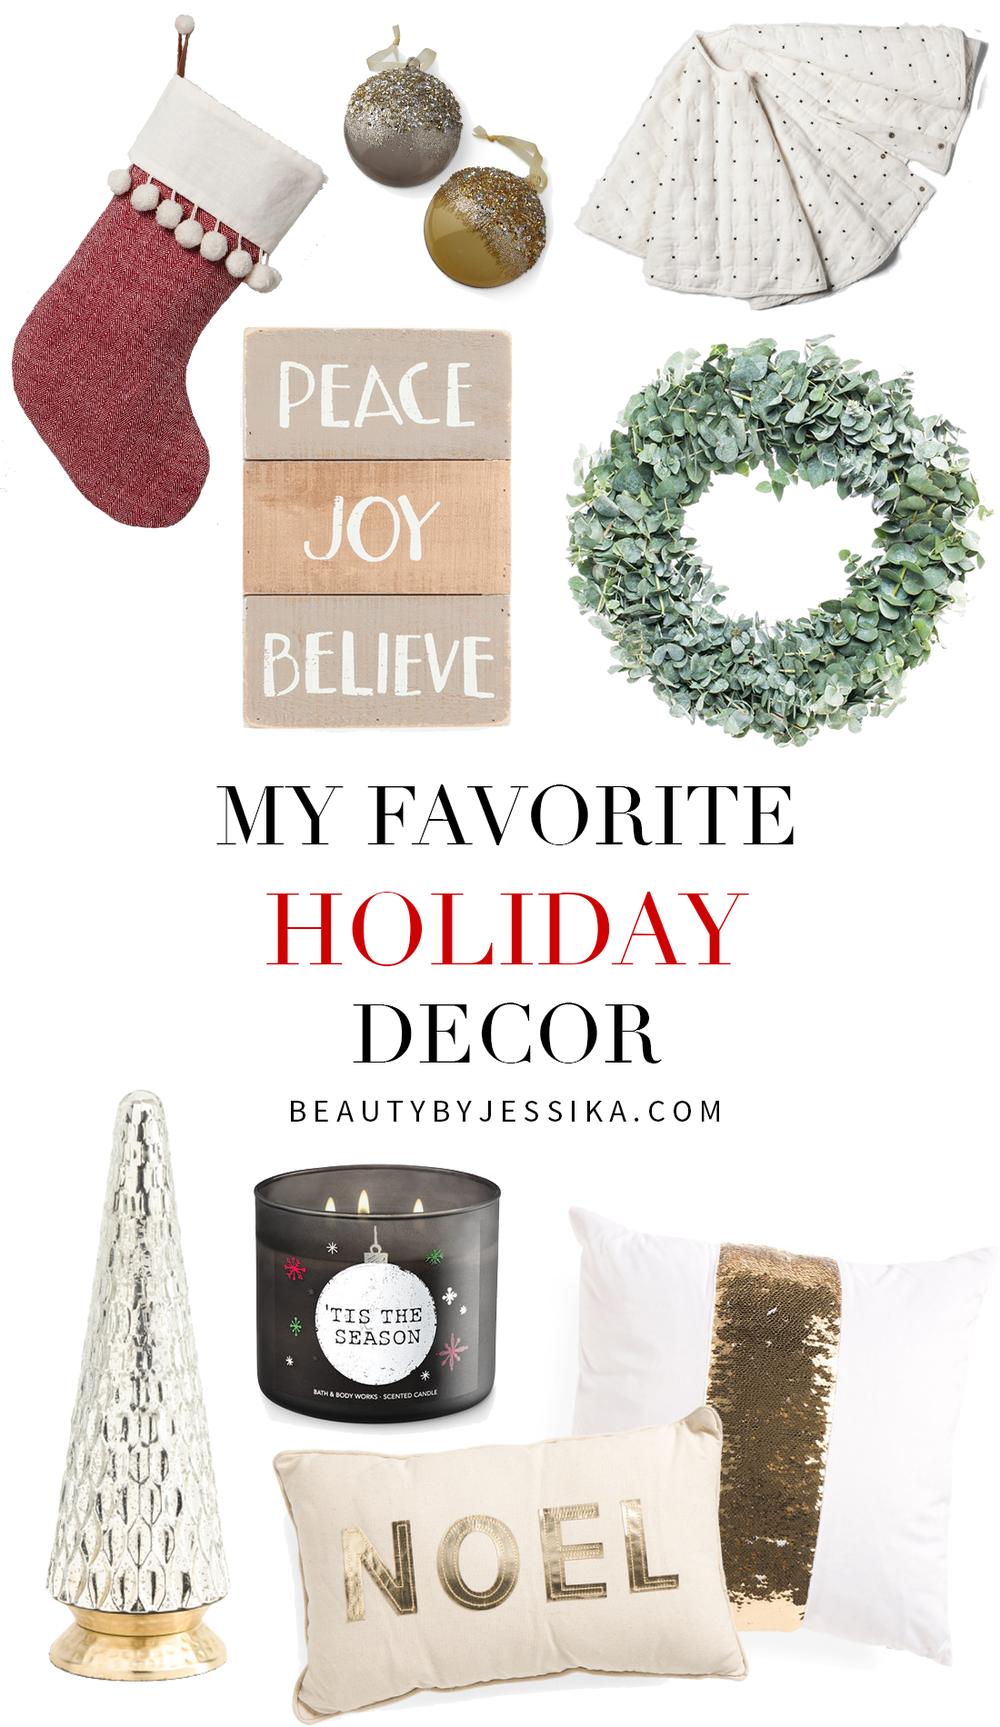 Peep my favorite holiday decor over on my blog, beautybyjessika.com.